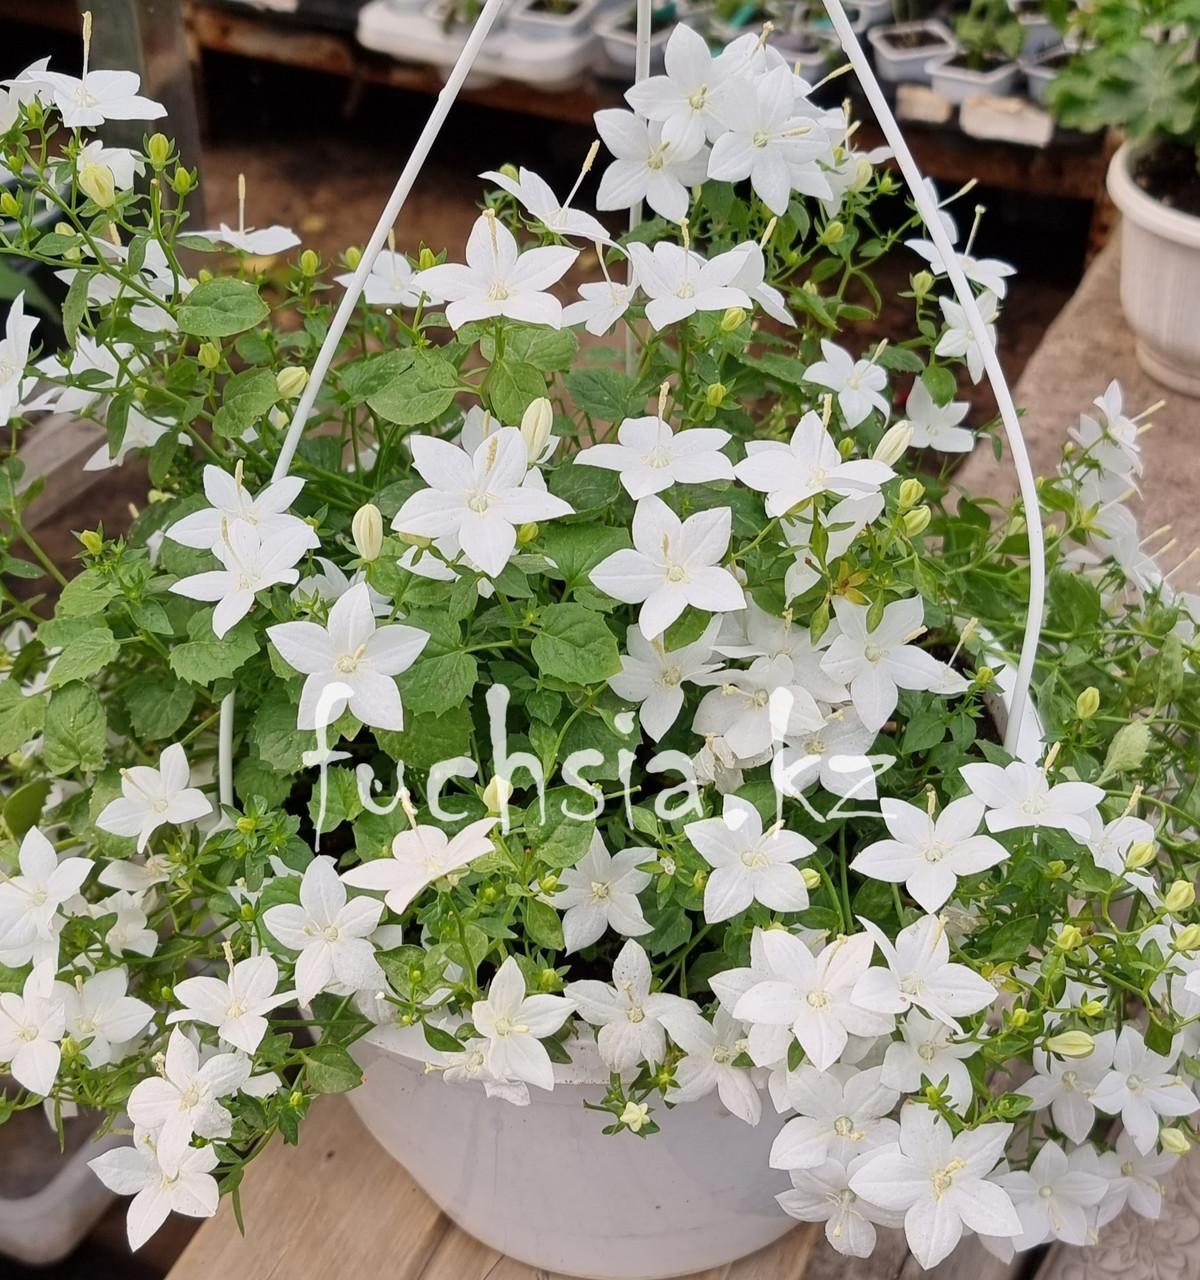 Isophila Atlanta White / взрослое цветущее растение